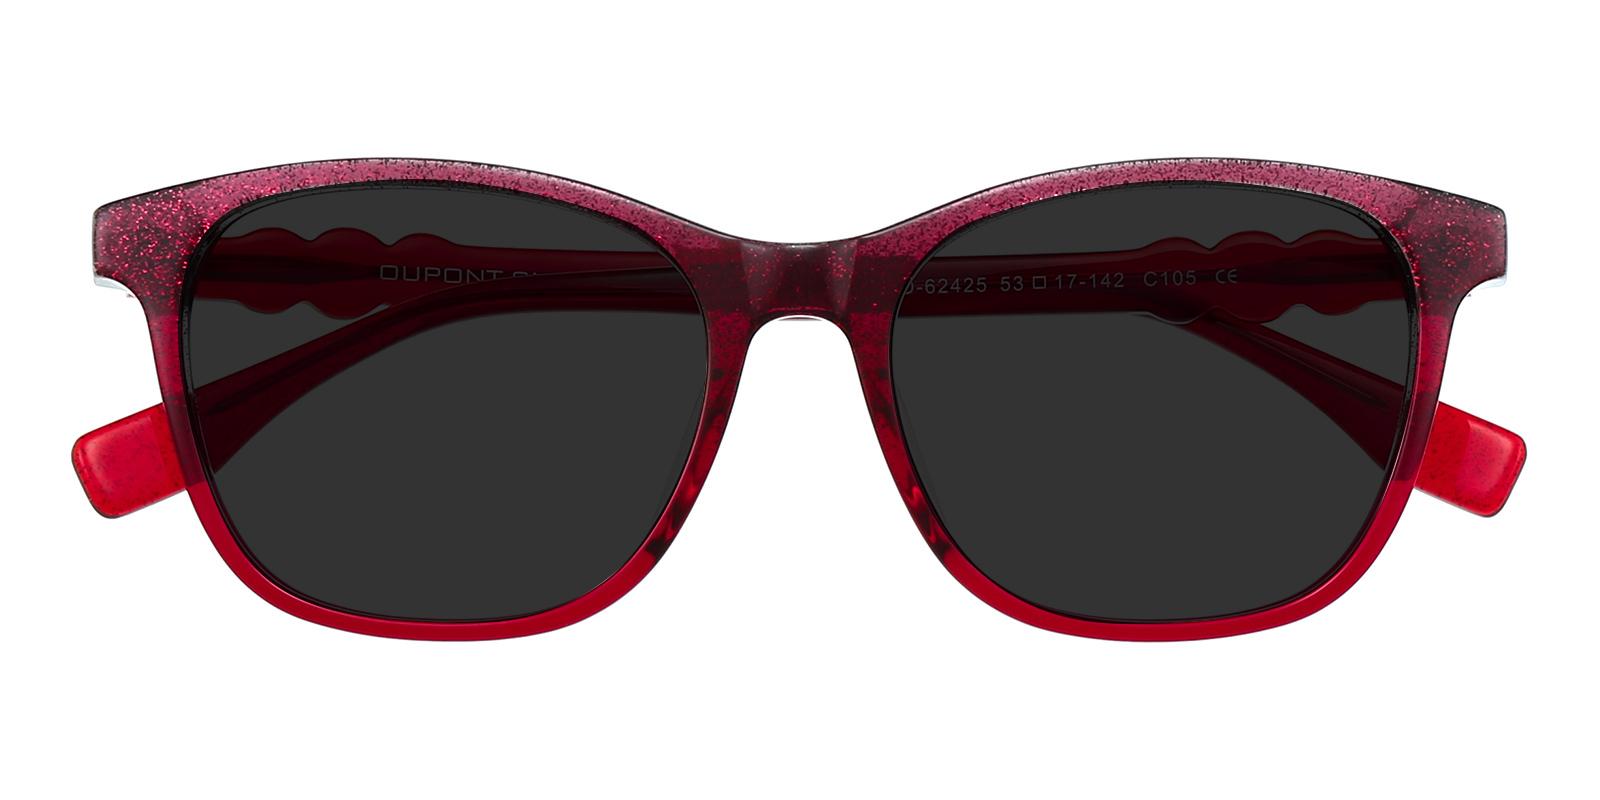 Women's Classic Wayframe Sunglasses, Full Frame Plastic Red - SUP0732